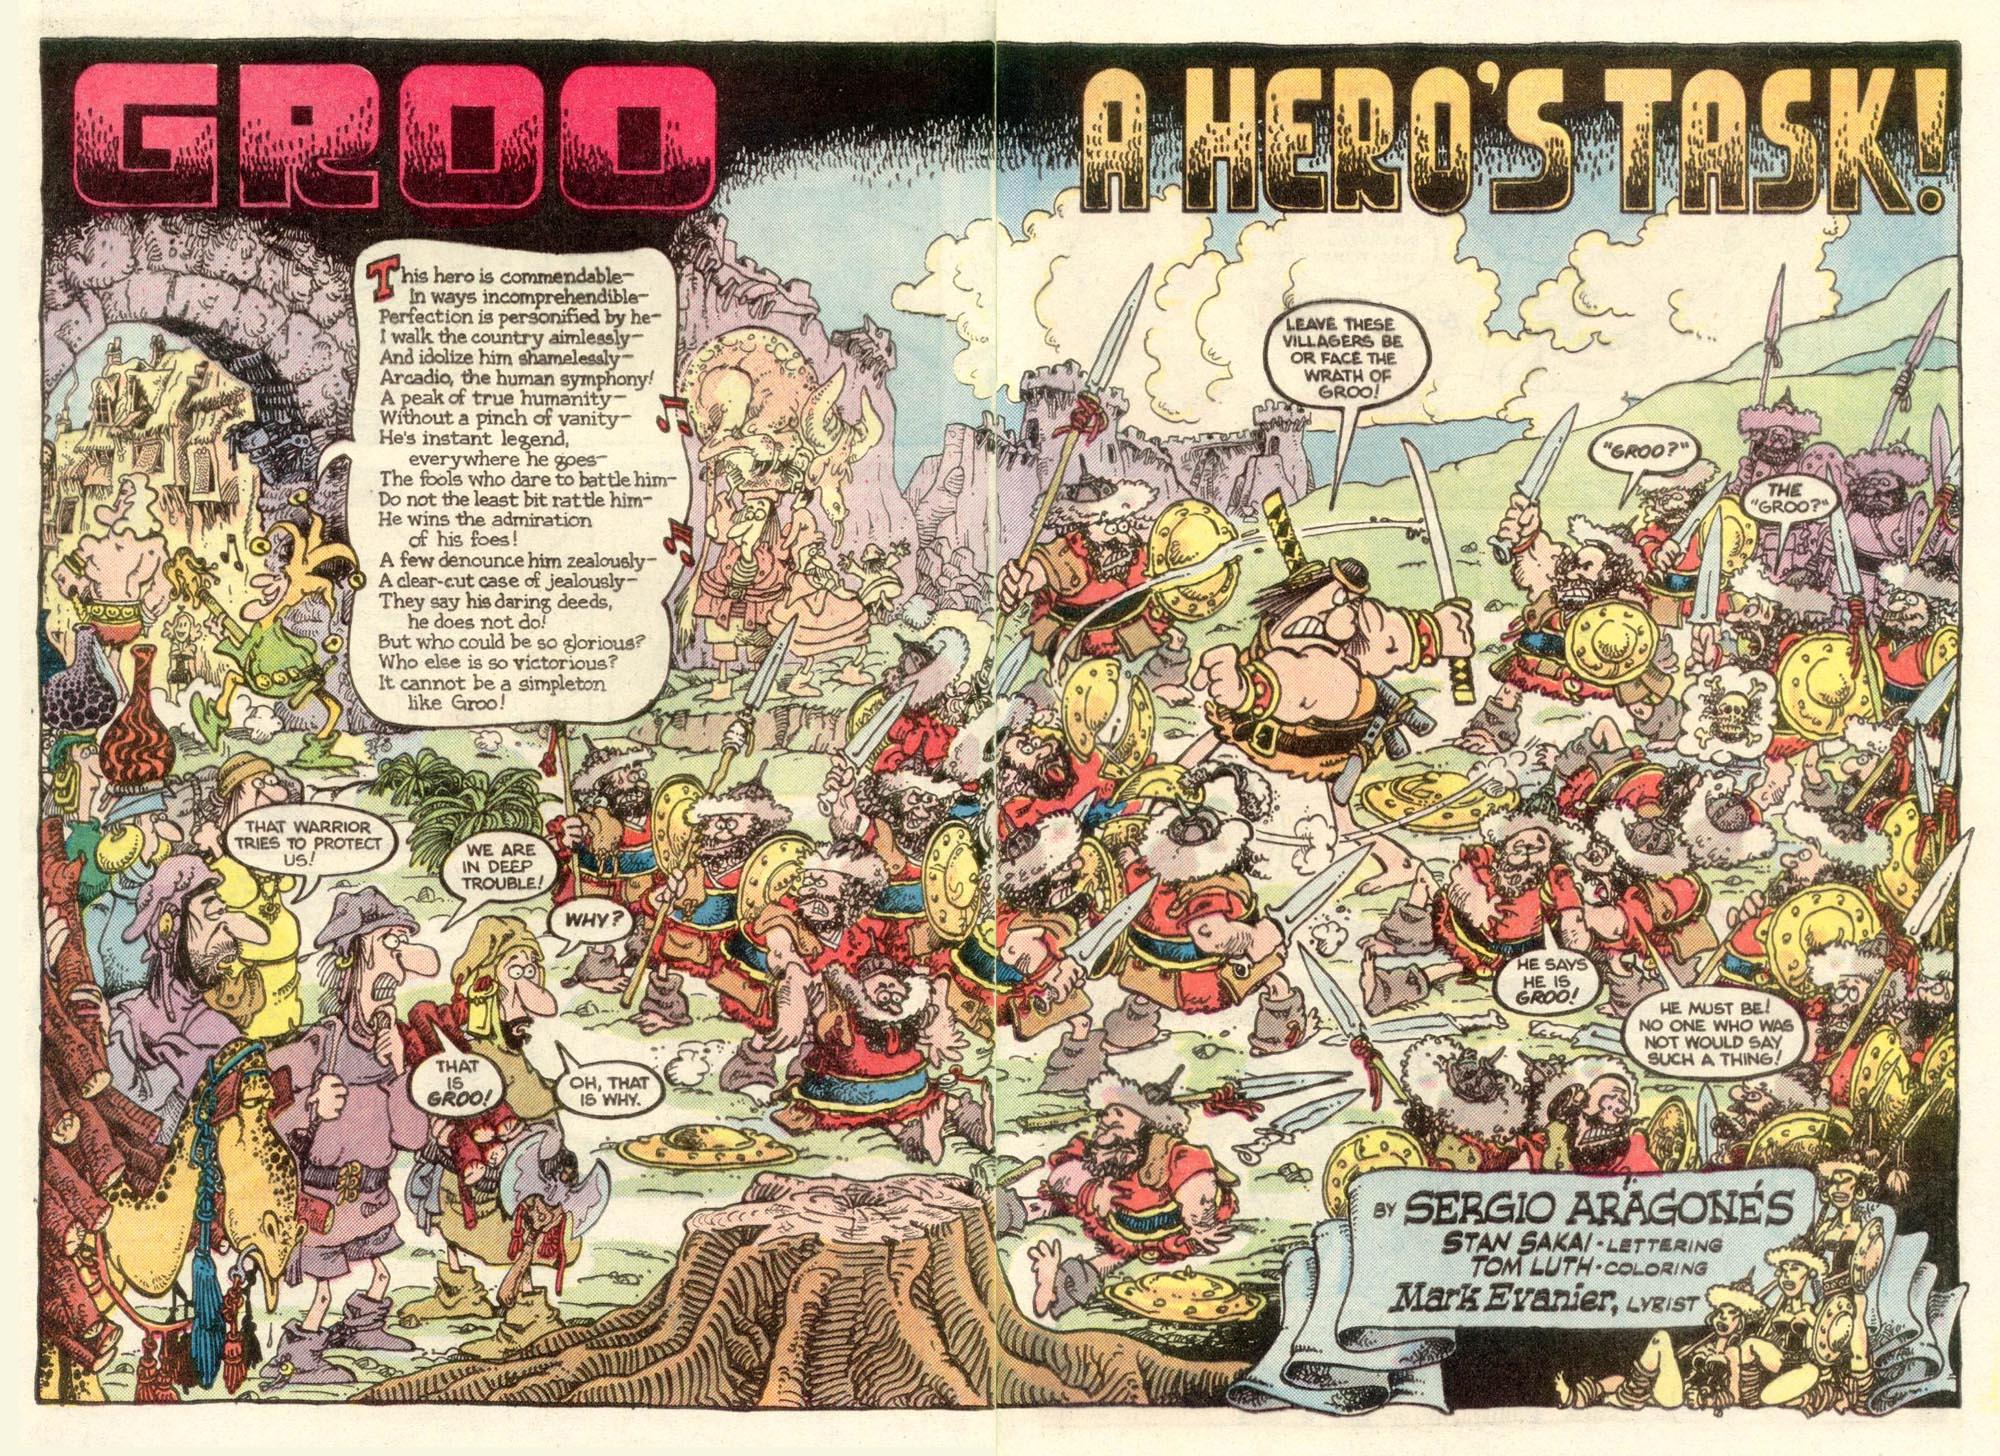 Read online Sergio Aragonés Groo the Wanderer comic -  Issue #11 - 3